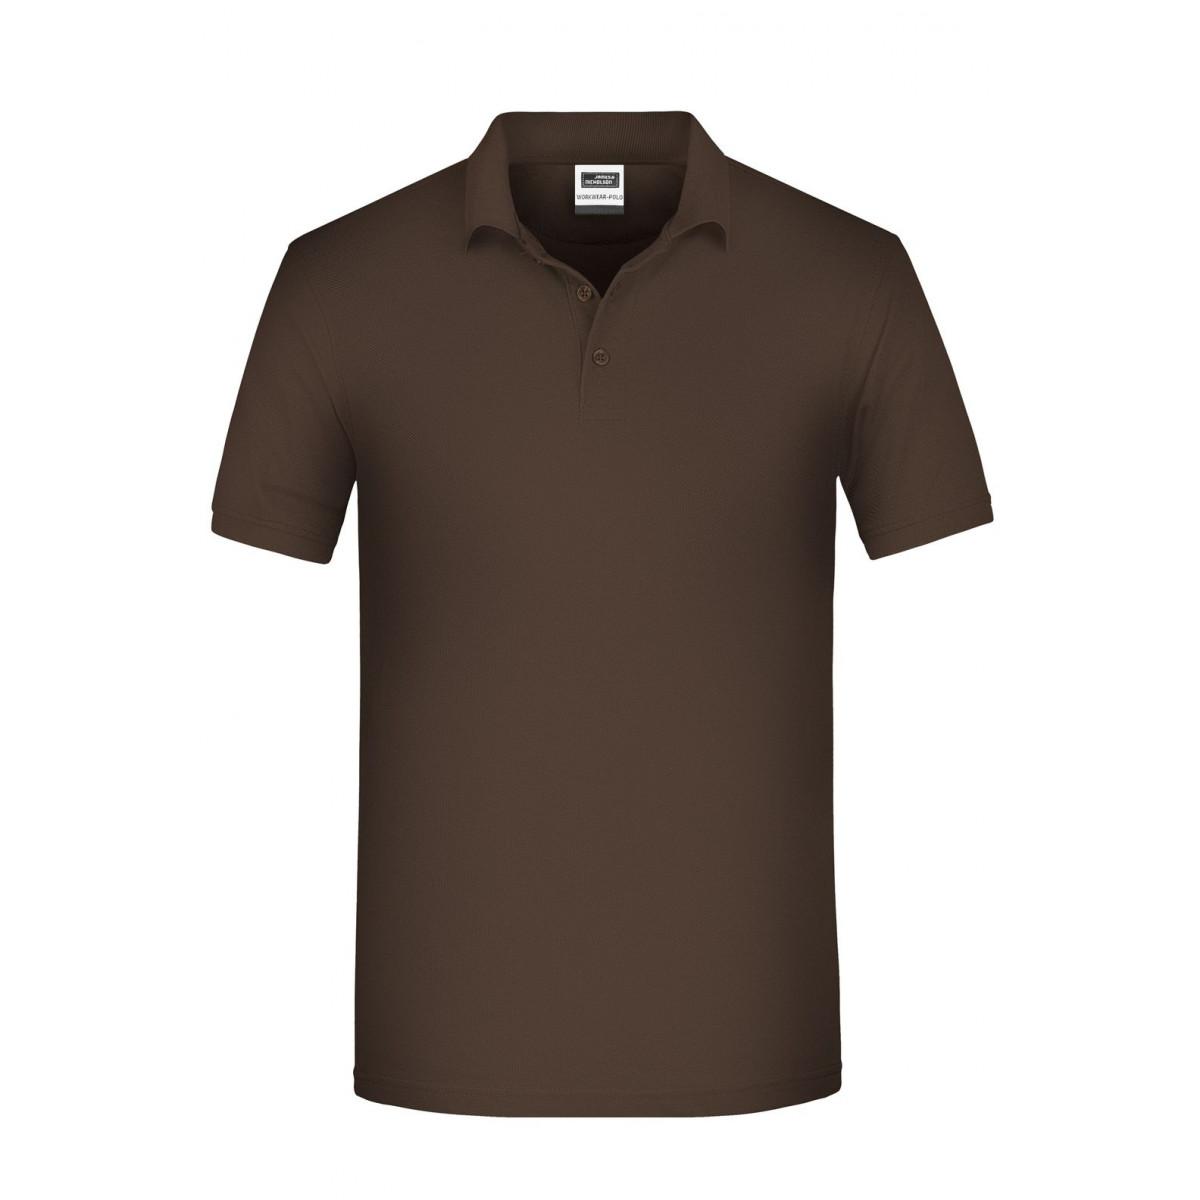 Рубашка поло мужская JN874 Mens BIO Workwear Polo - Коричневый